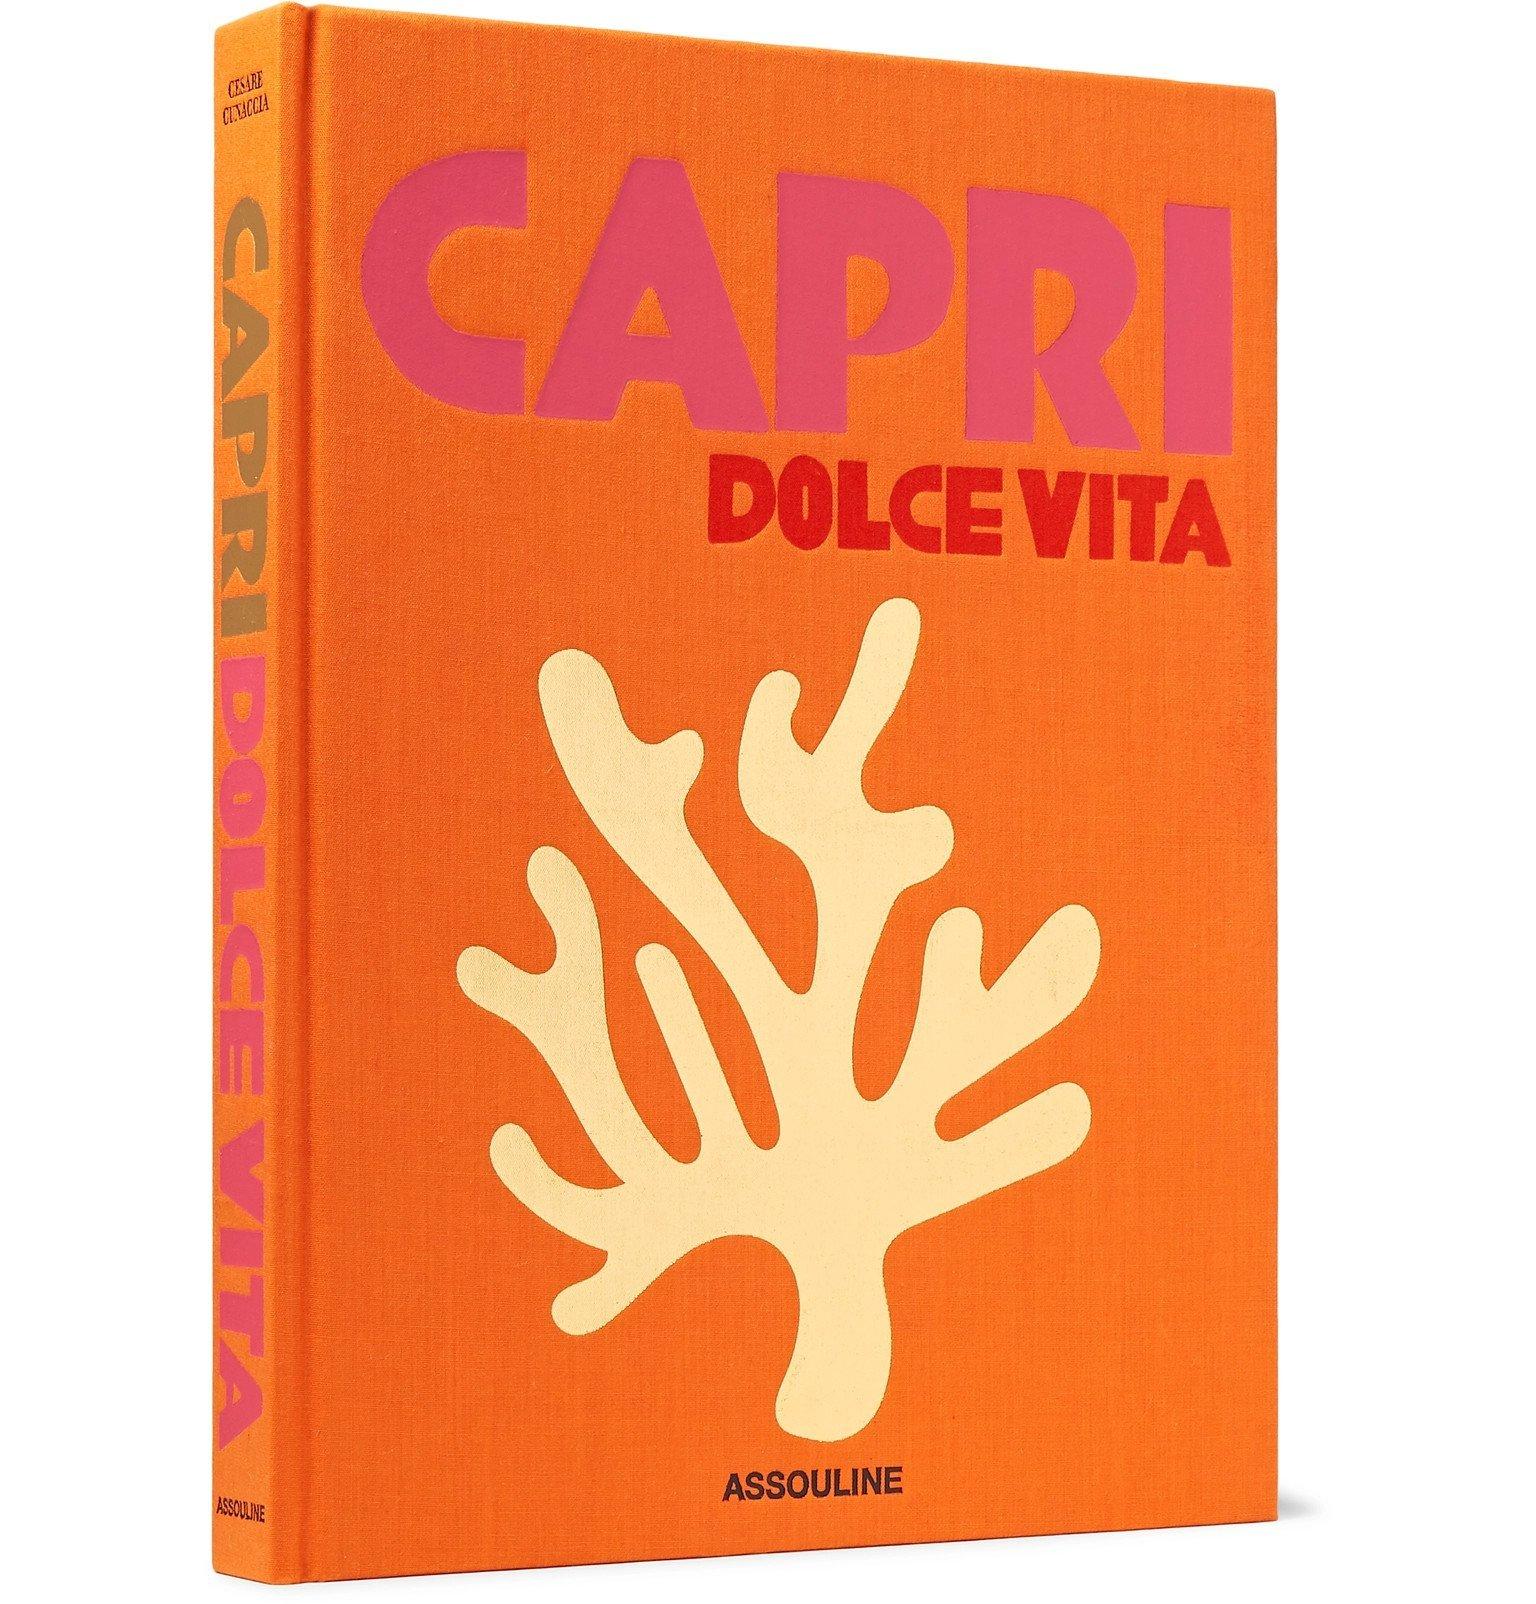 Photo: Assouline - Capri Dolce Vita Hardcover Book - Orange